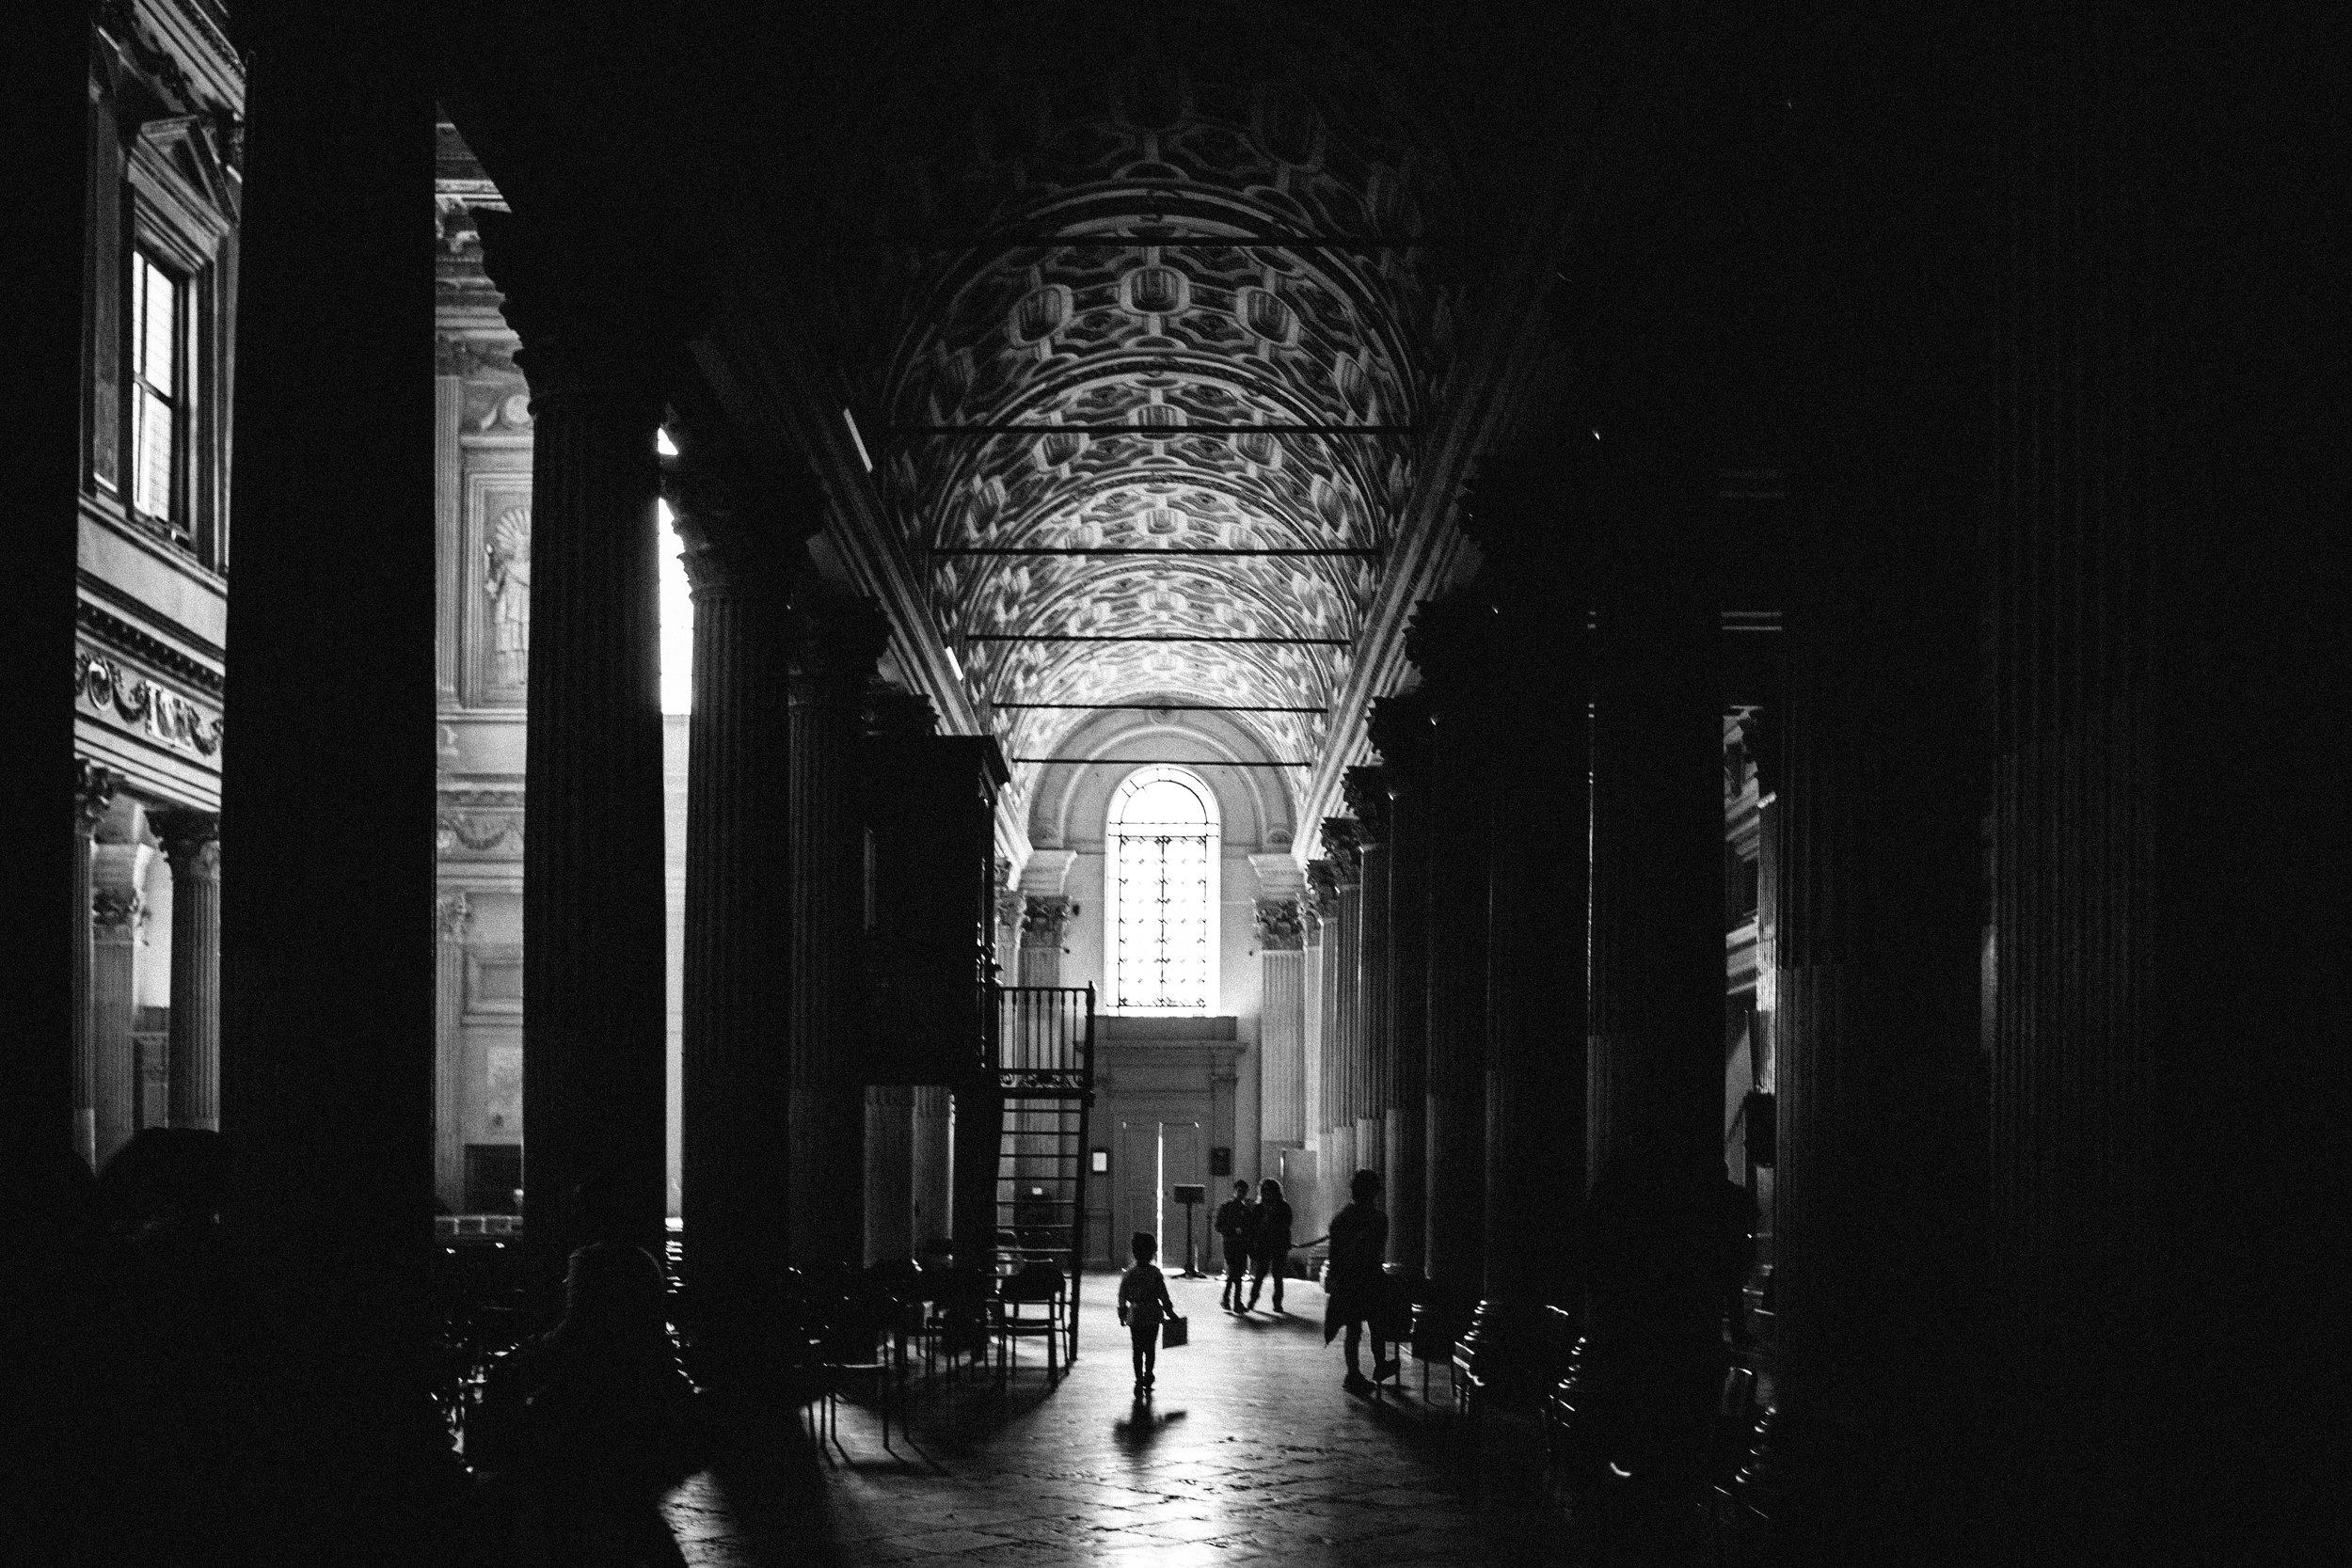 069 - Mantova.jpg